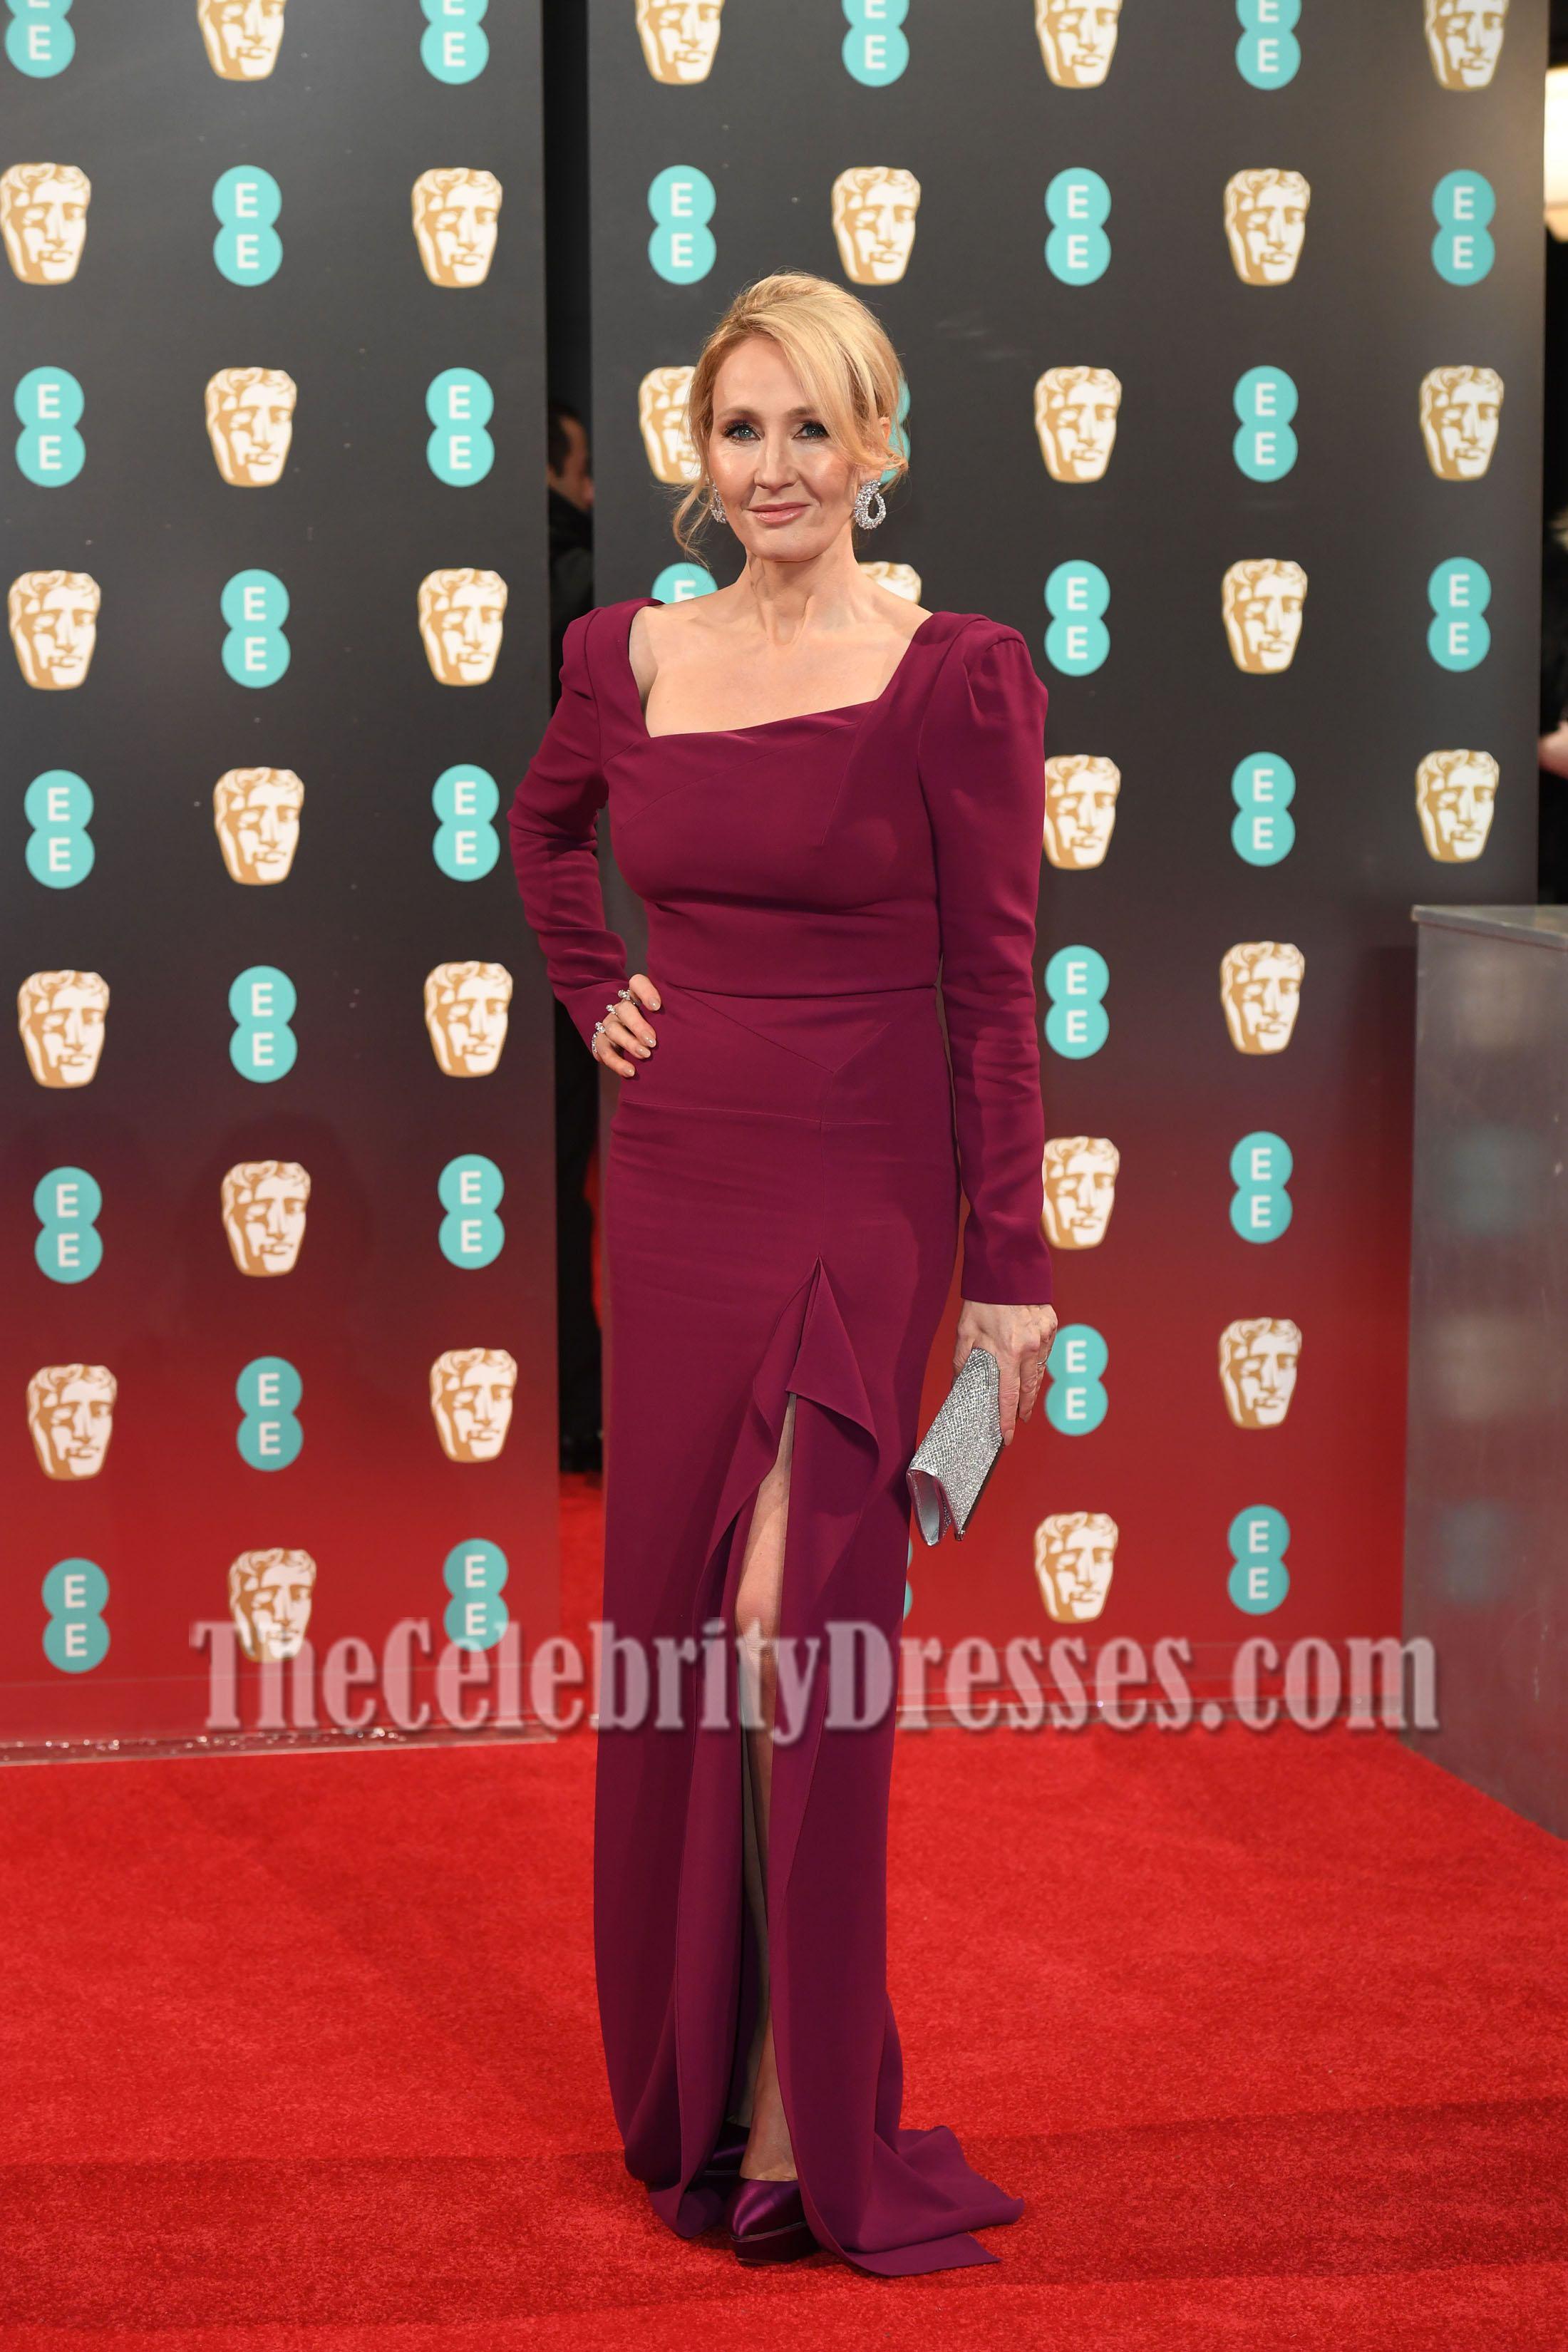 J. K. Rowling 2017 BAFTA Red Carpet Evening Dress Square Neck High ...